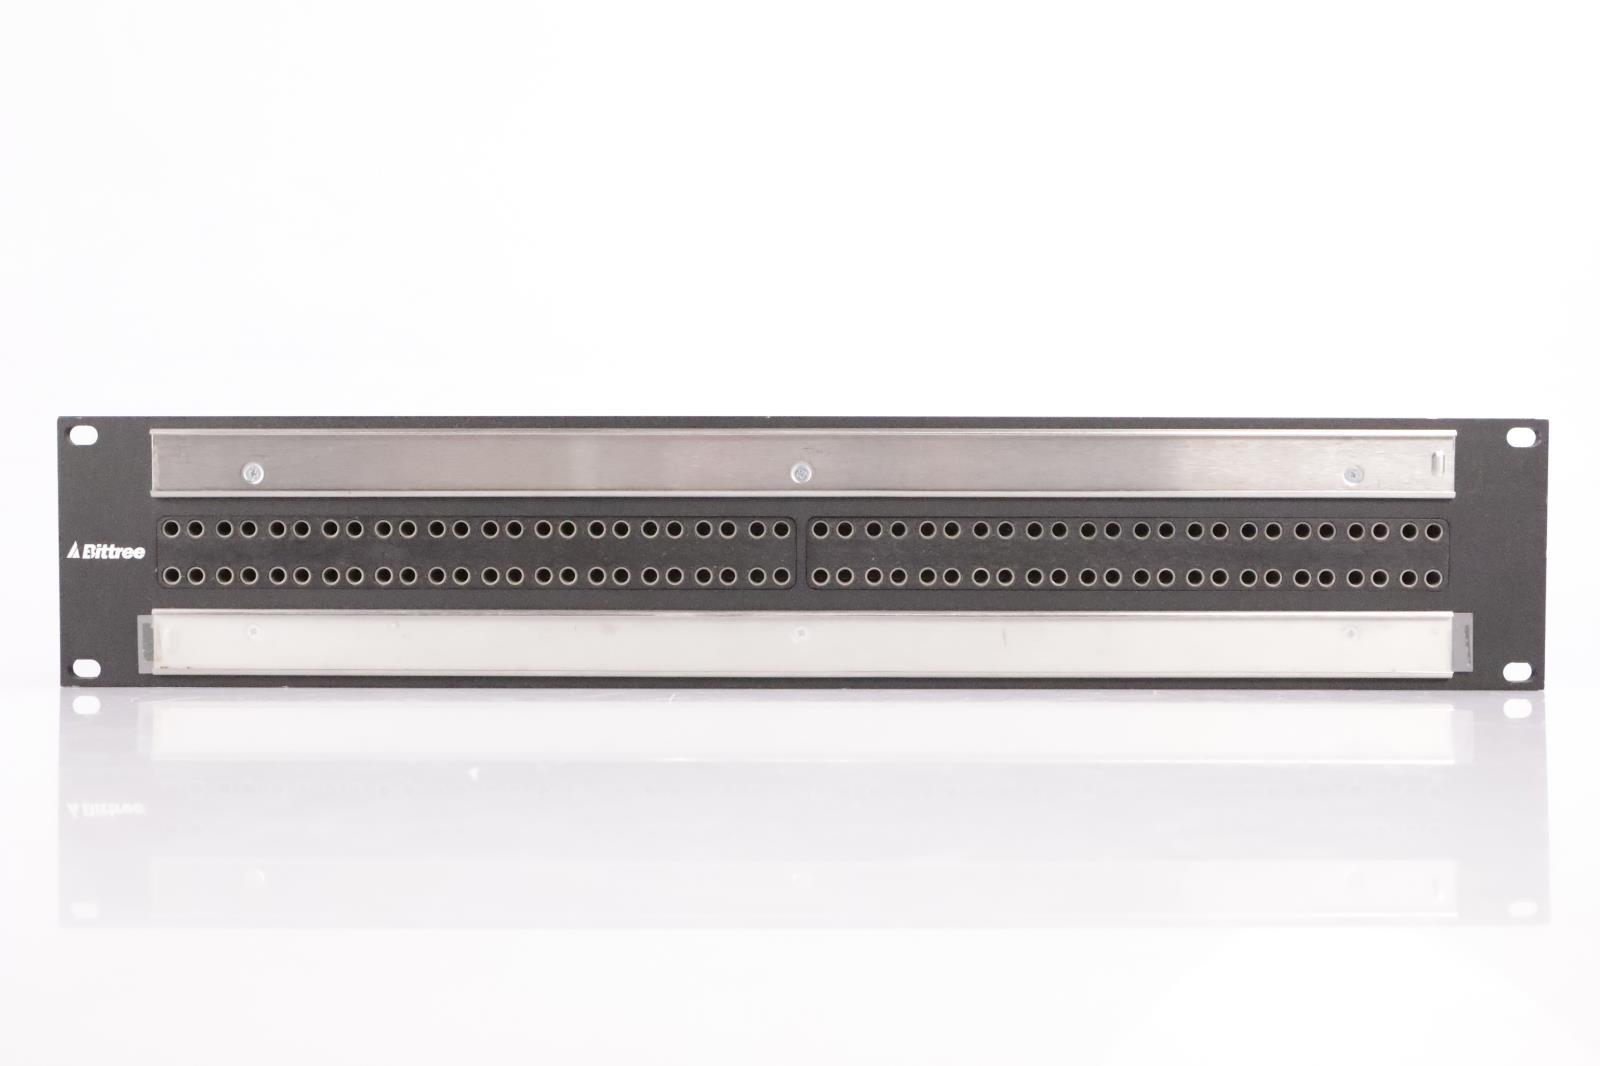 Bittree B96DC-FNLBT/E3 96 Point TT Patcbay w/ XLR TRS DB25 Snake Cables #34111